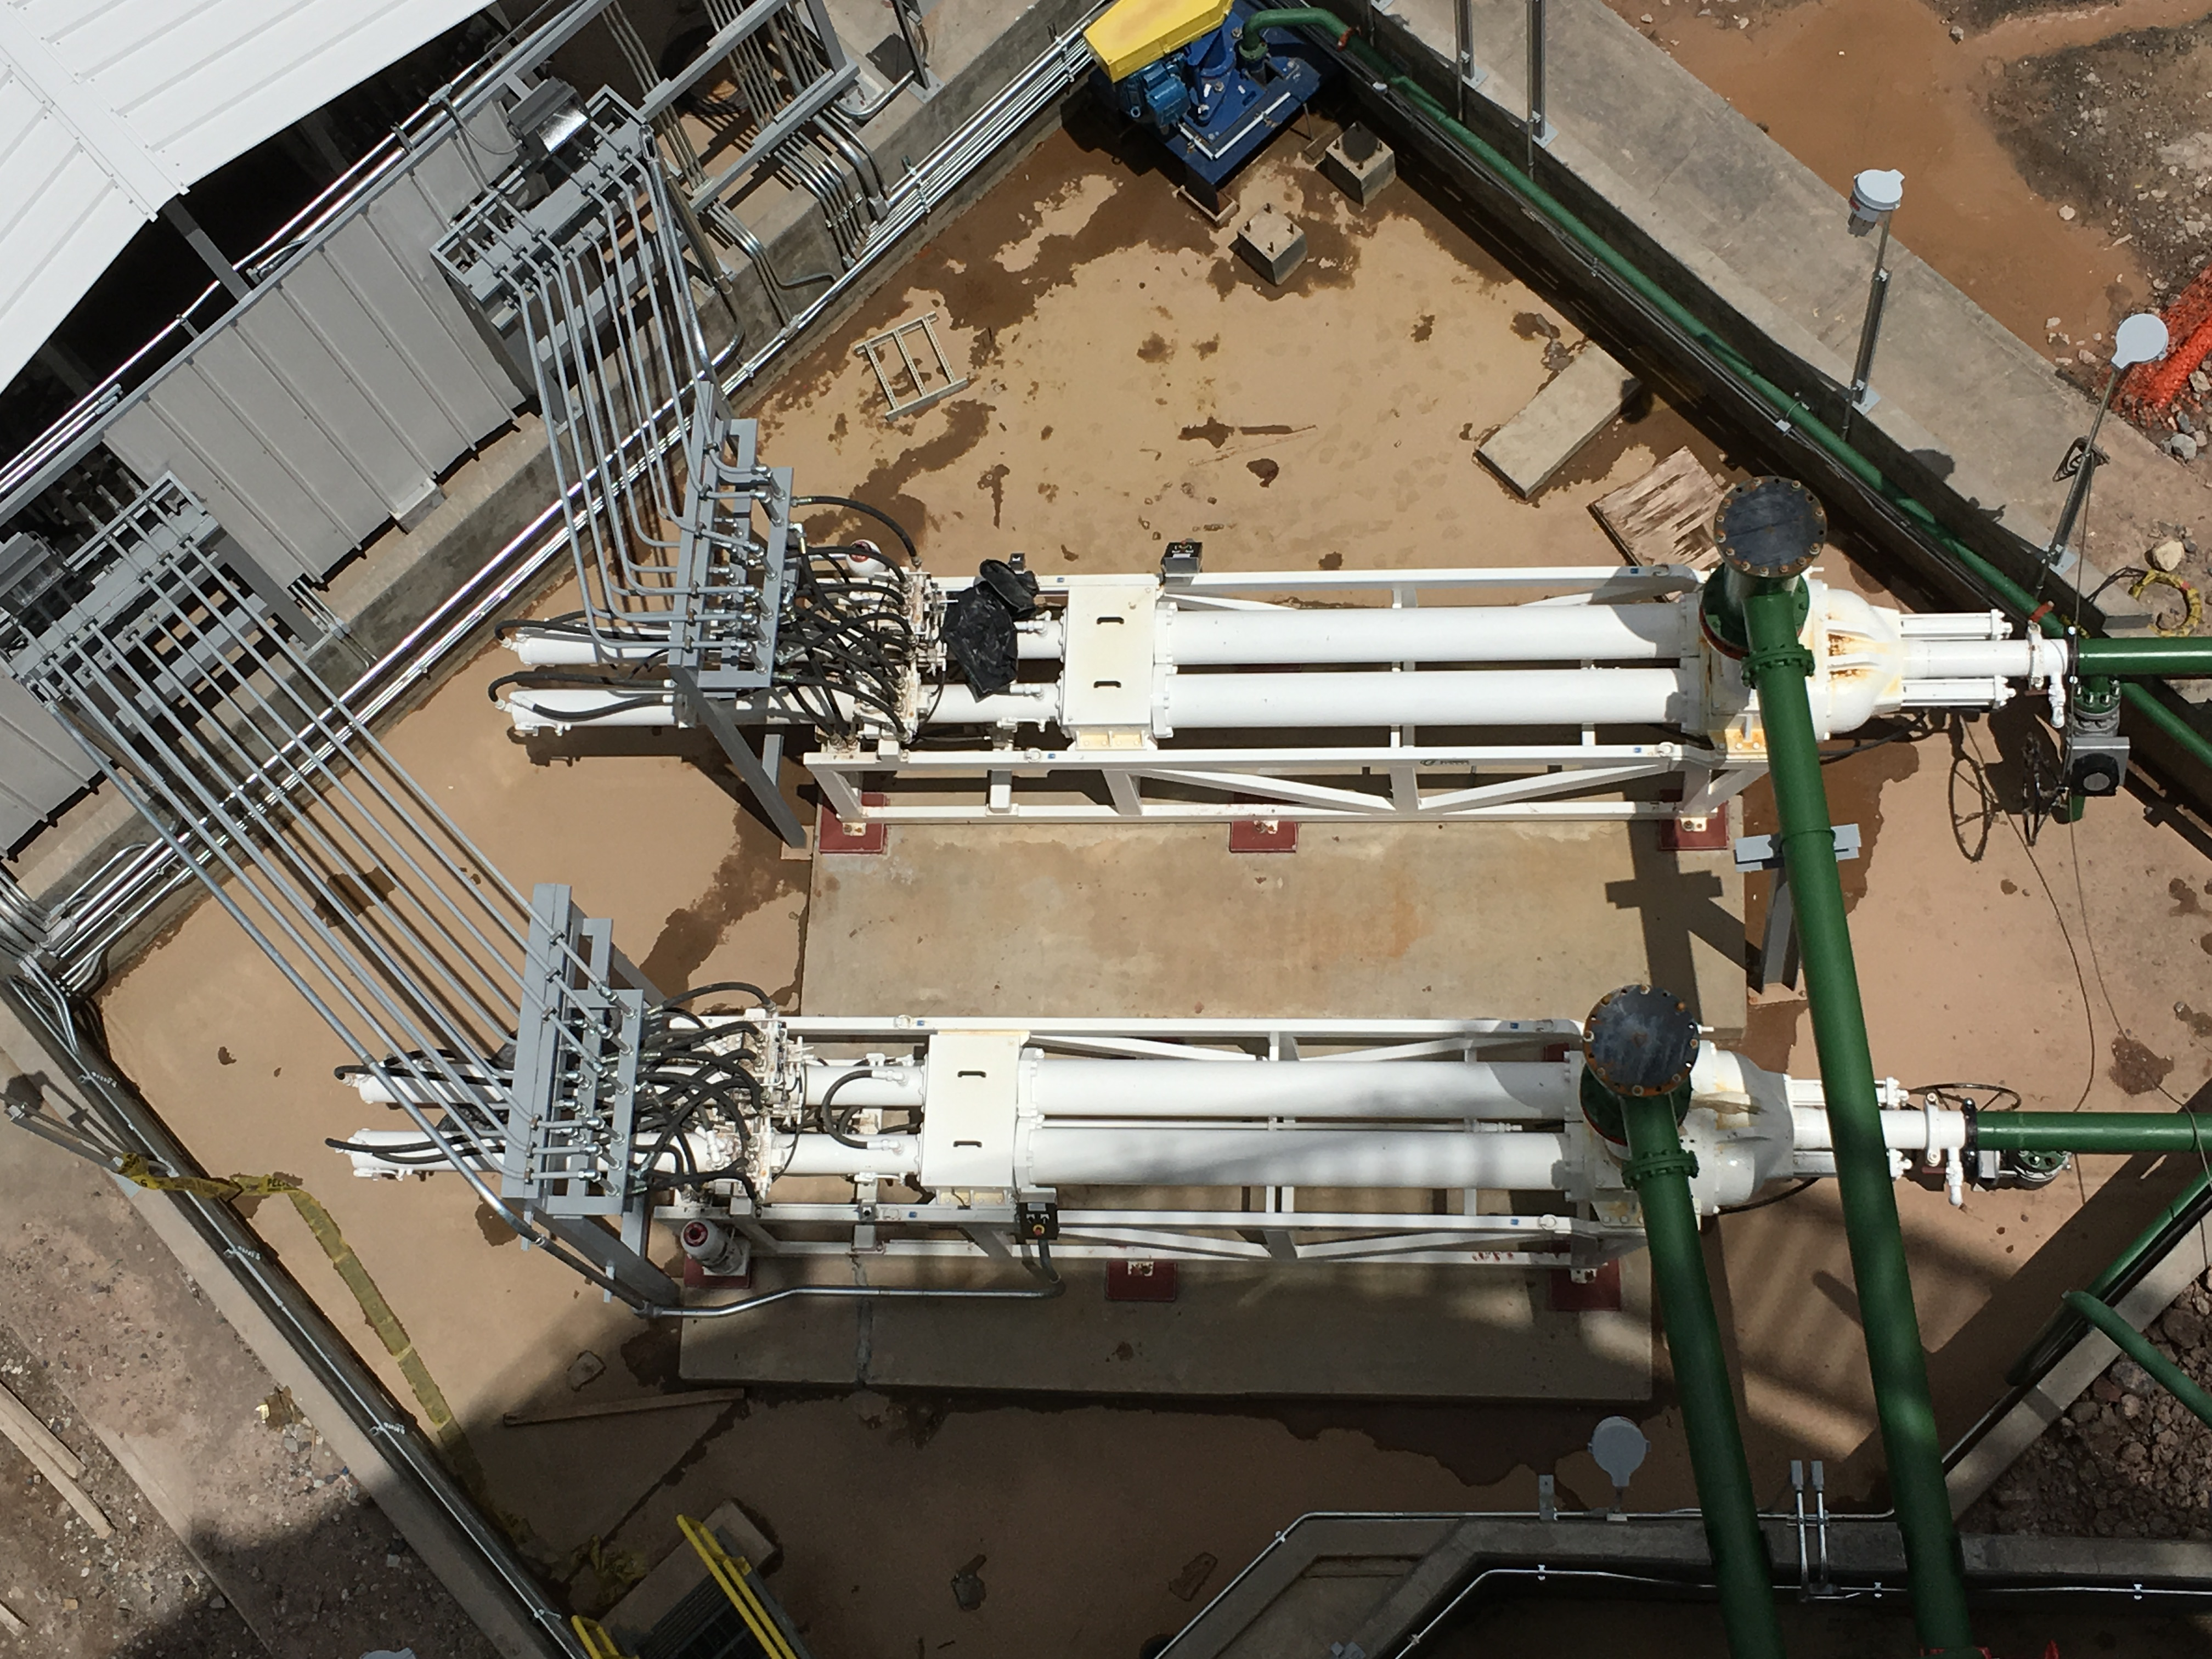 Rumichaca_mining pumps.jpg